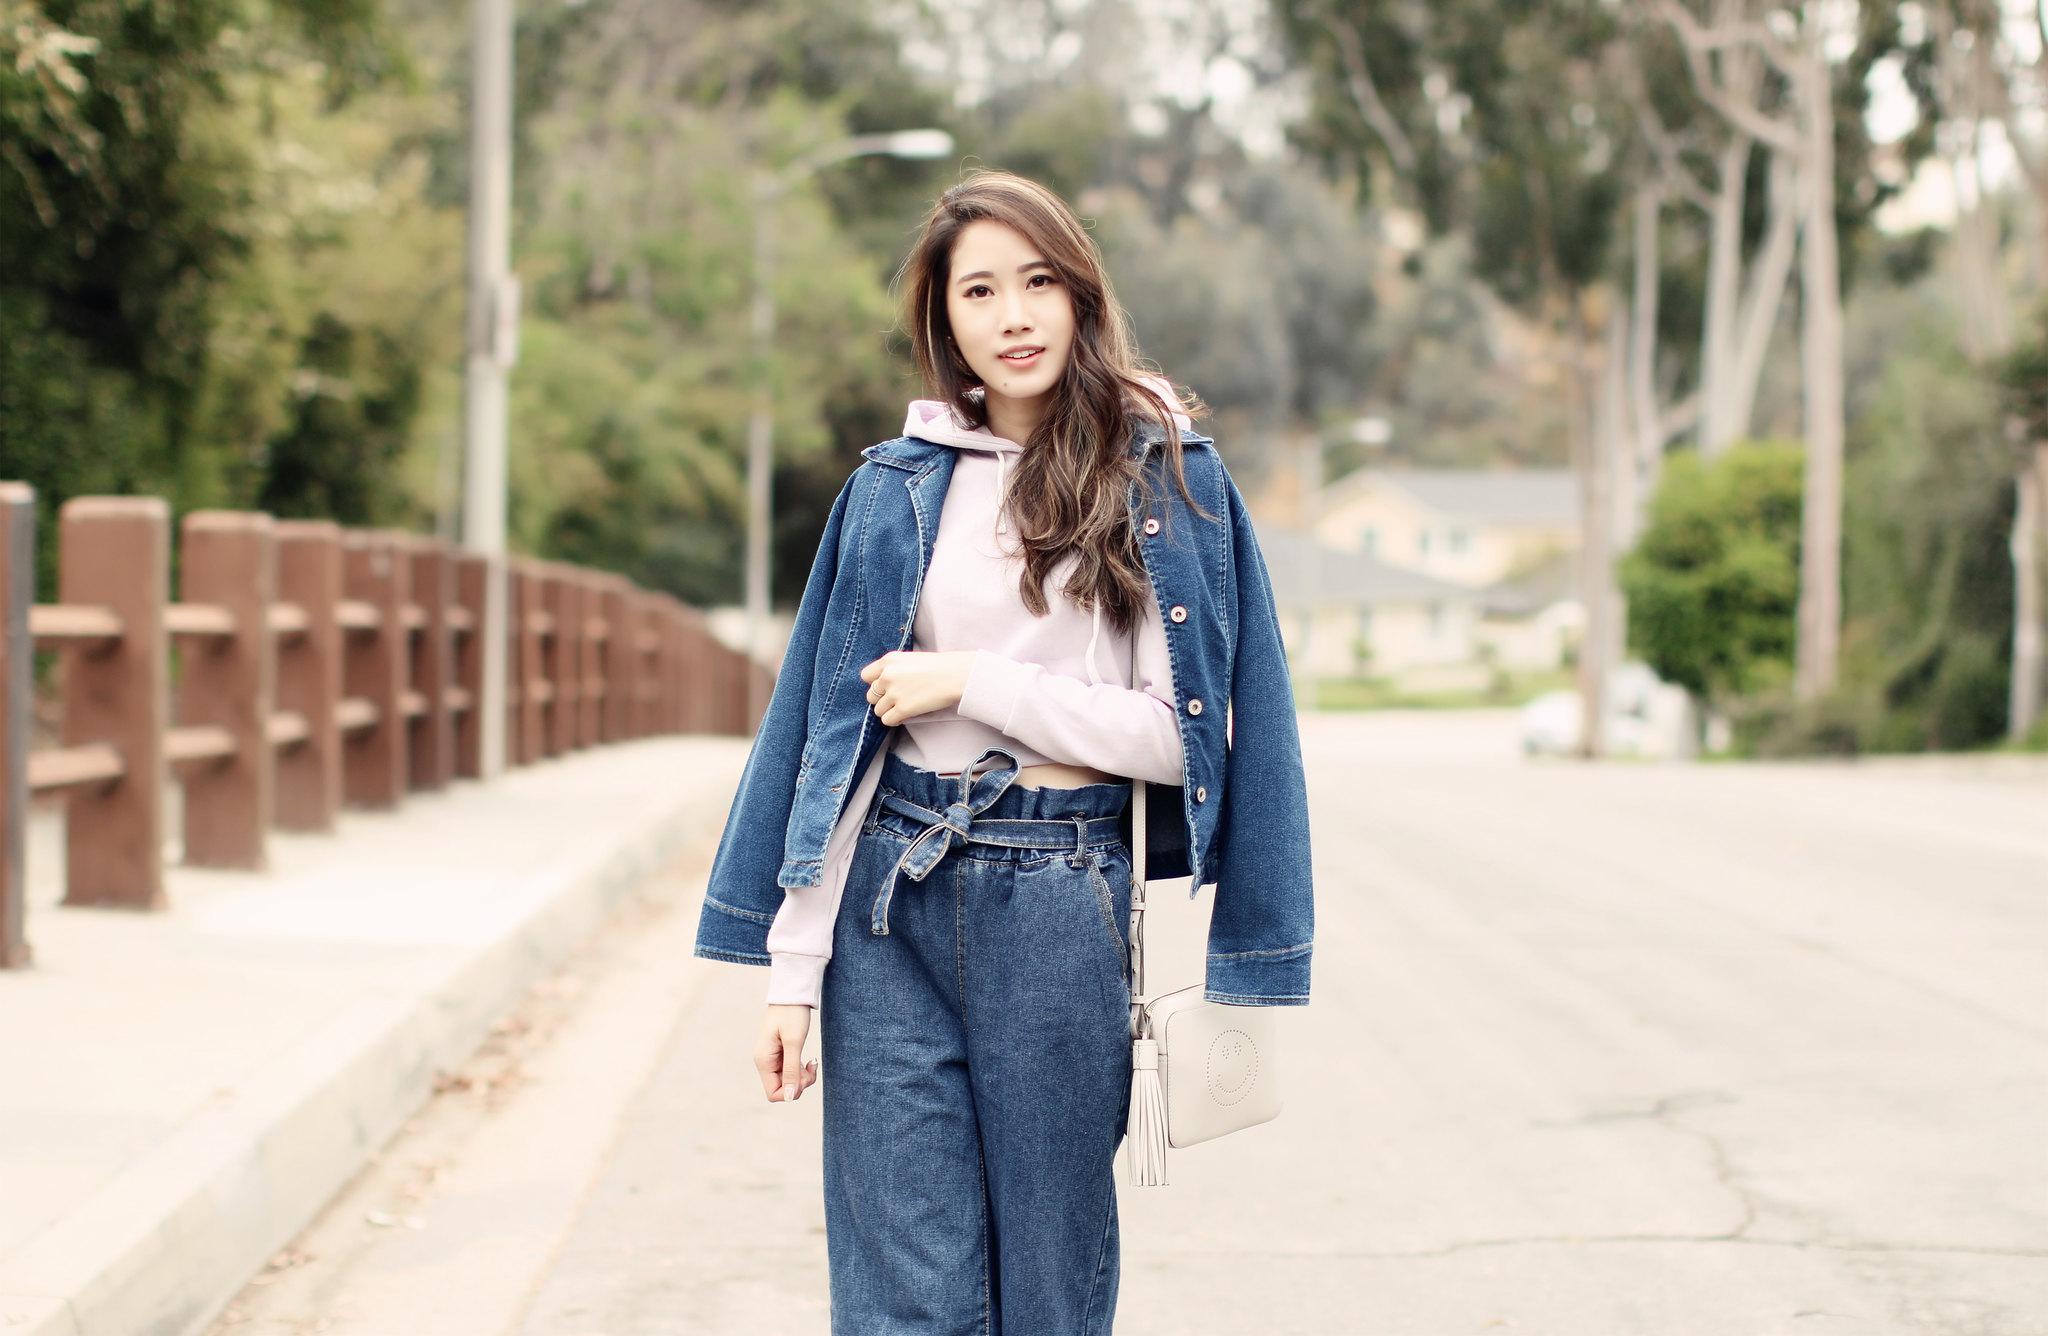 5079-ootd-fashion-style-outfitoftheday-wiwt-streetstyle-zara-f21xme-denim-thrifted-guess-koreanfashion-lookbook-elizabeeetht-clothestoyouuu